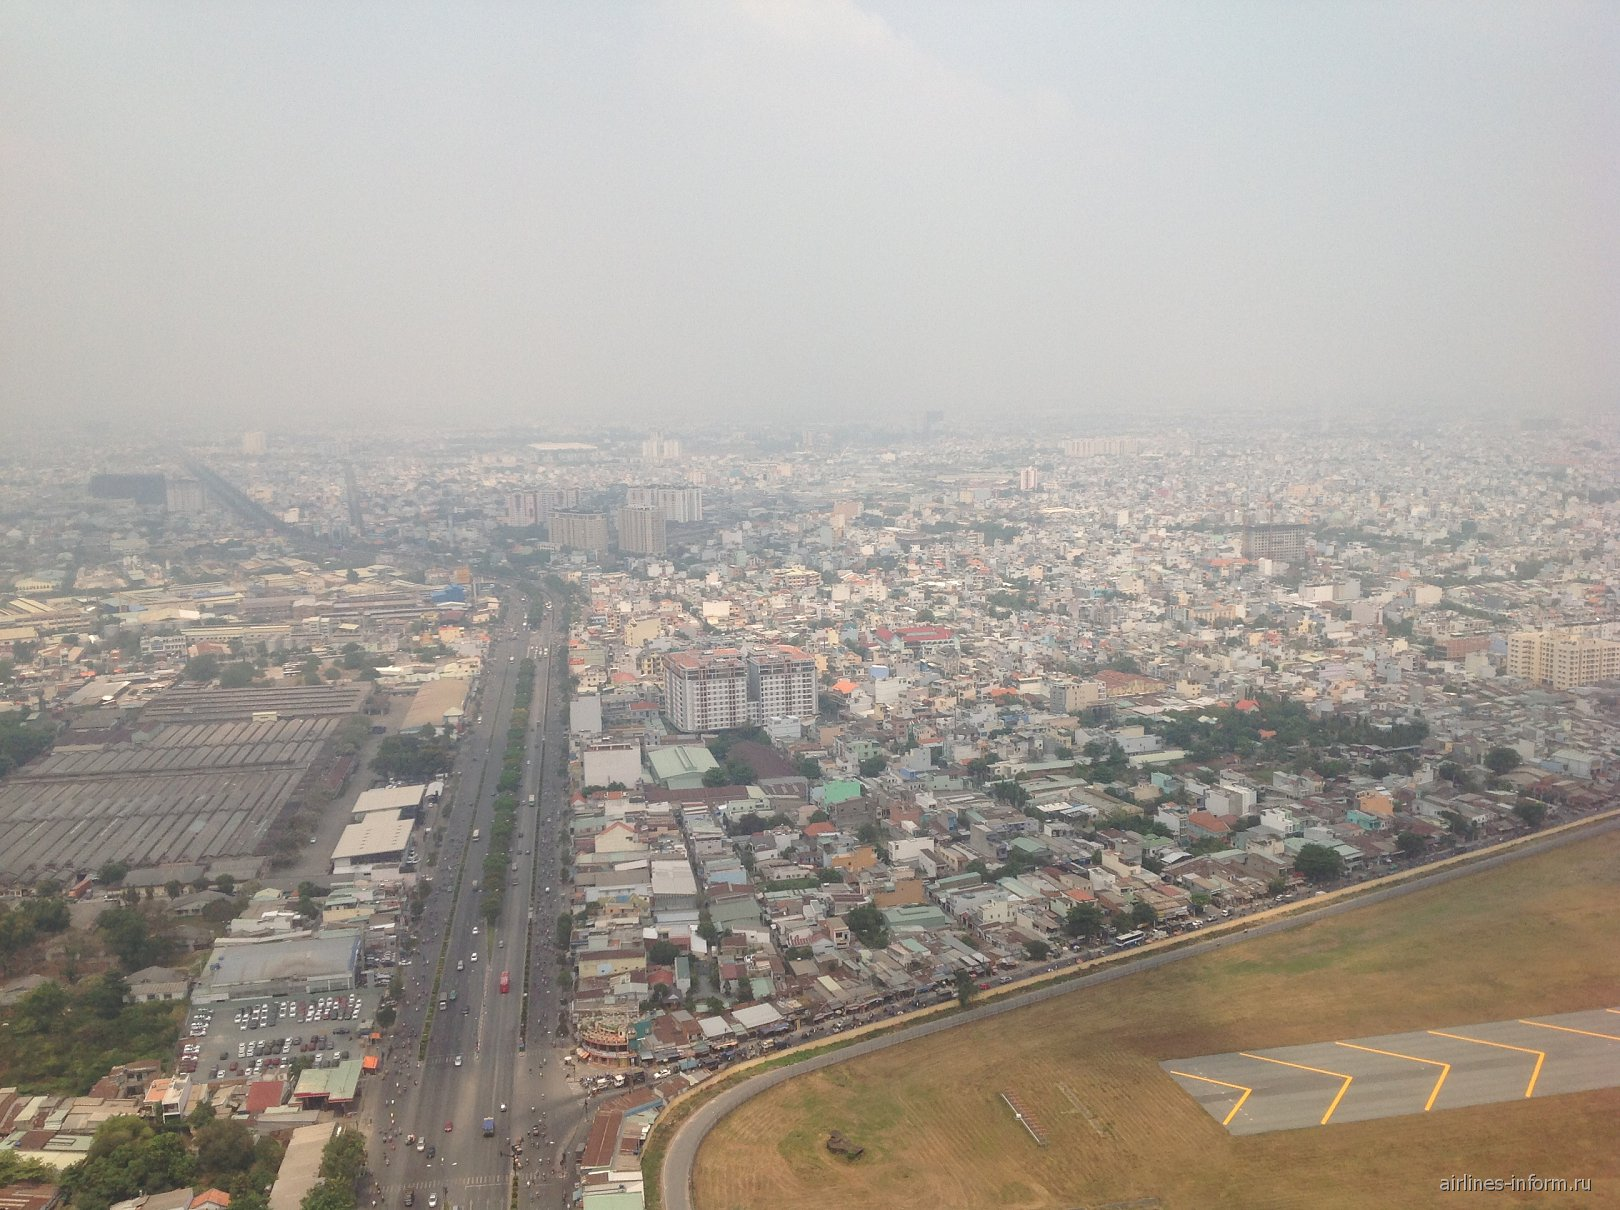 Вид на город Хошимин при взлете из аэропорта Тан Сон Нхат